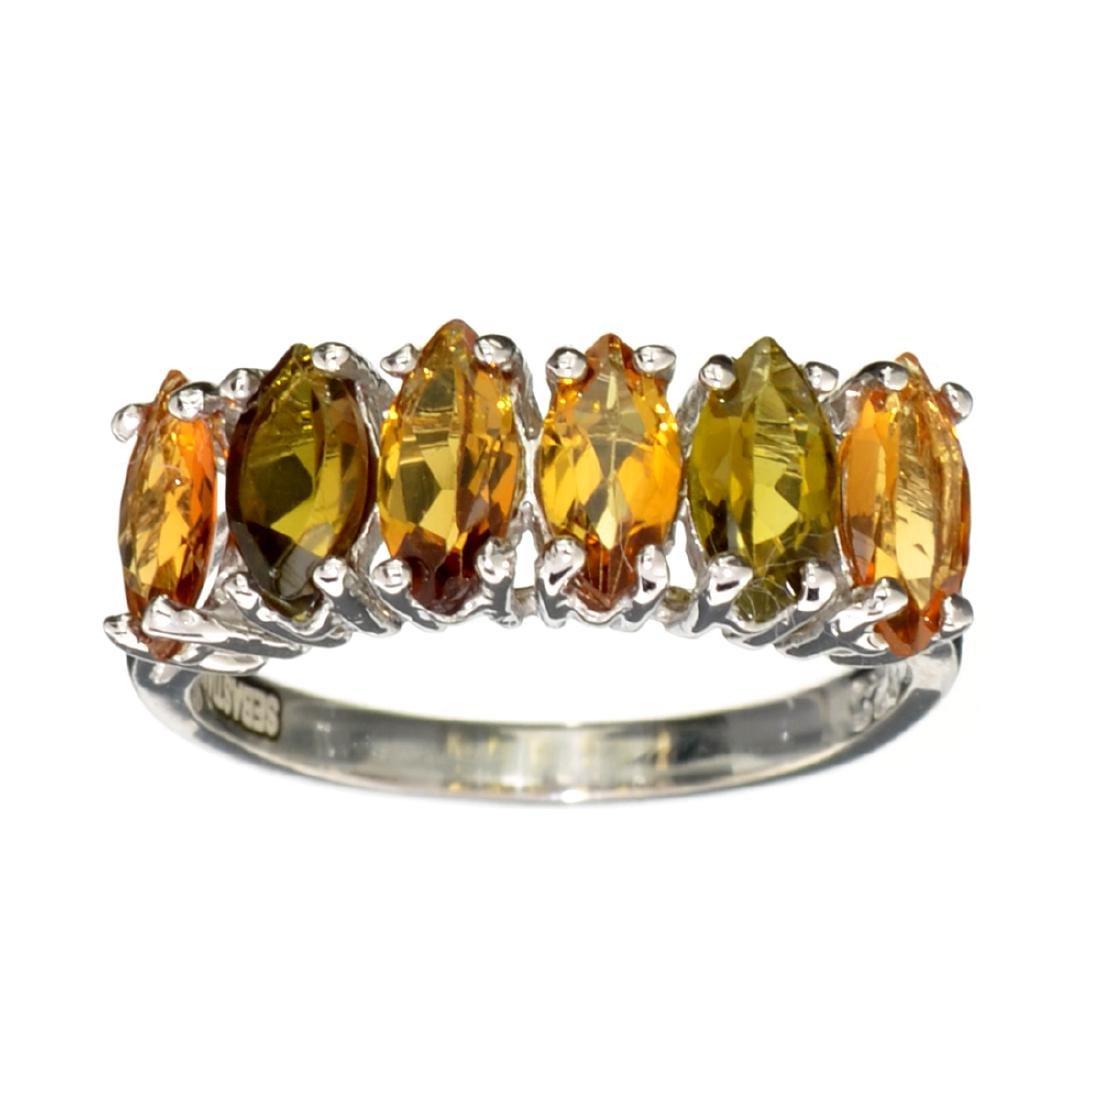 APP: 0.8k Fine Jewelry Designer Sebastian, 1.92CT